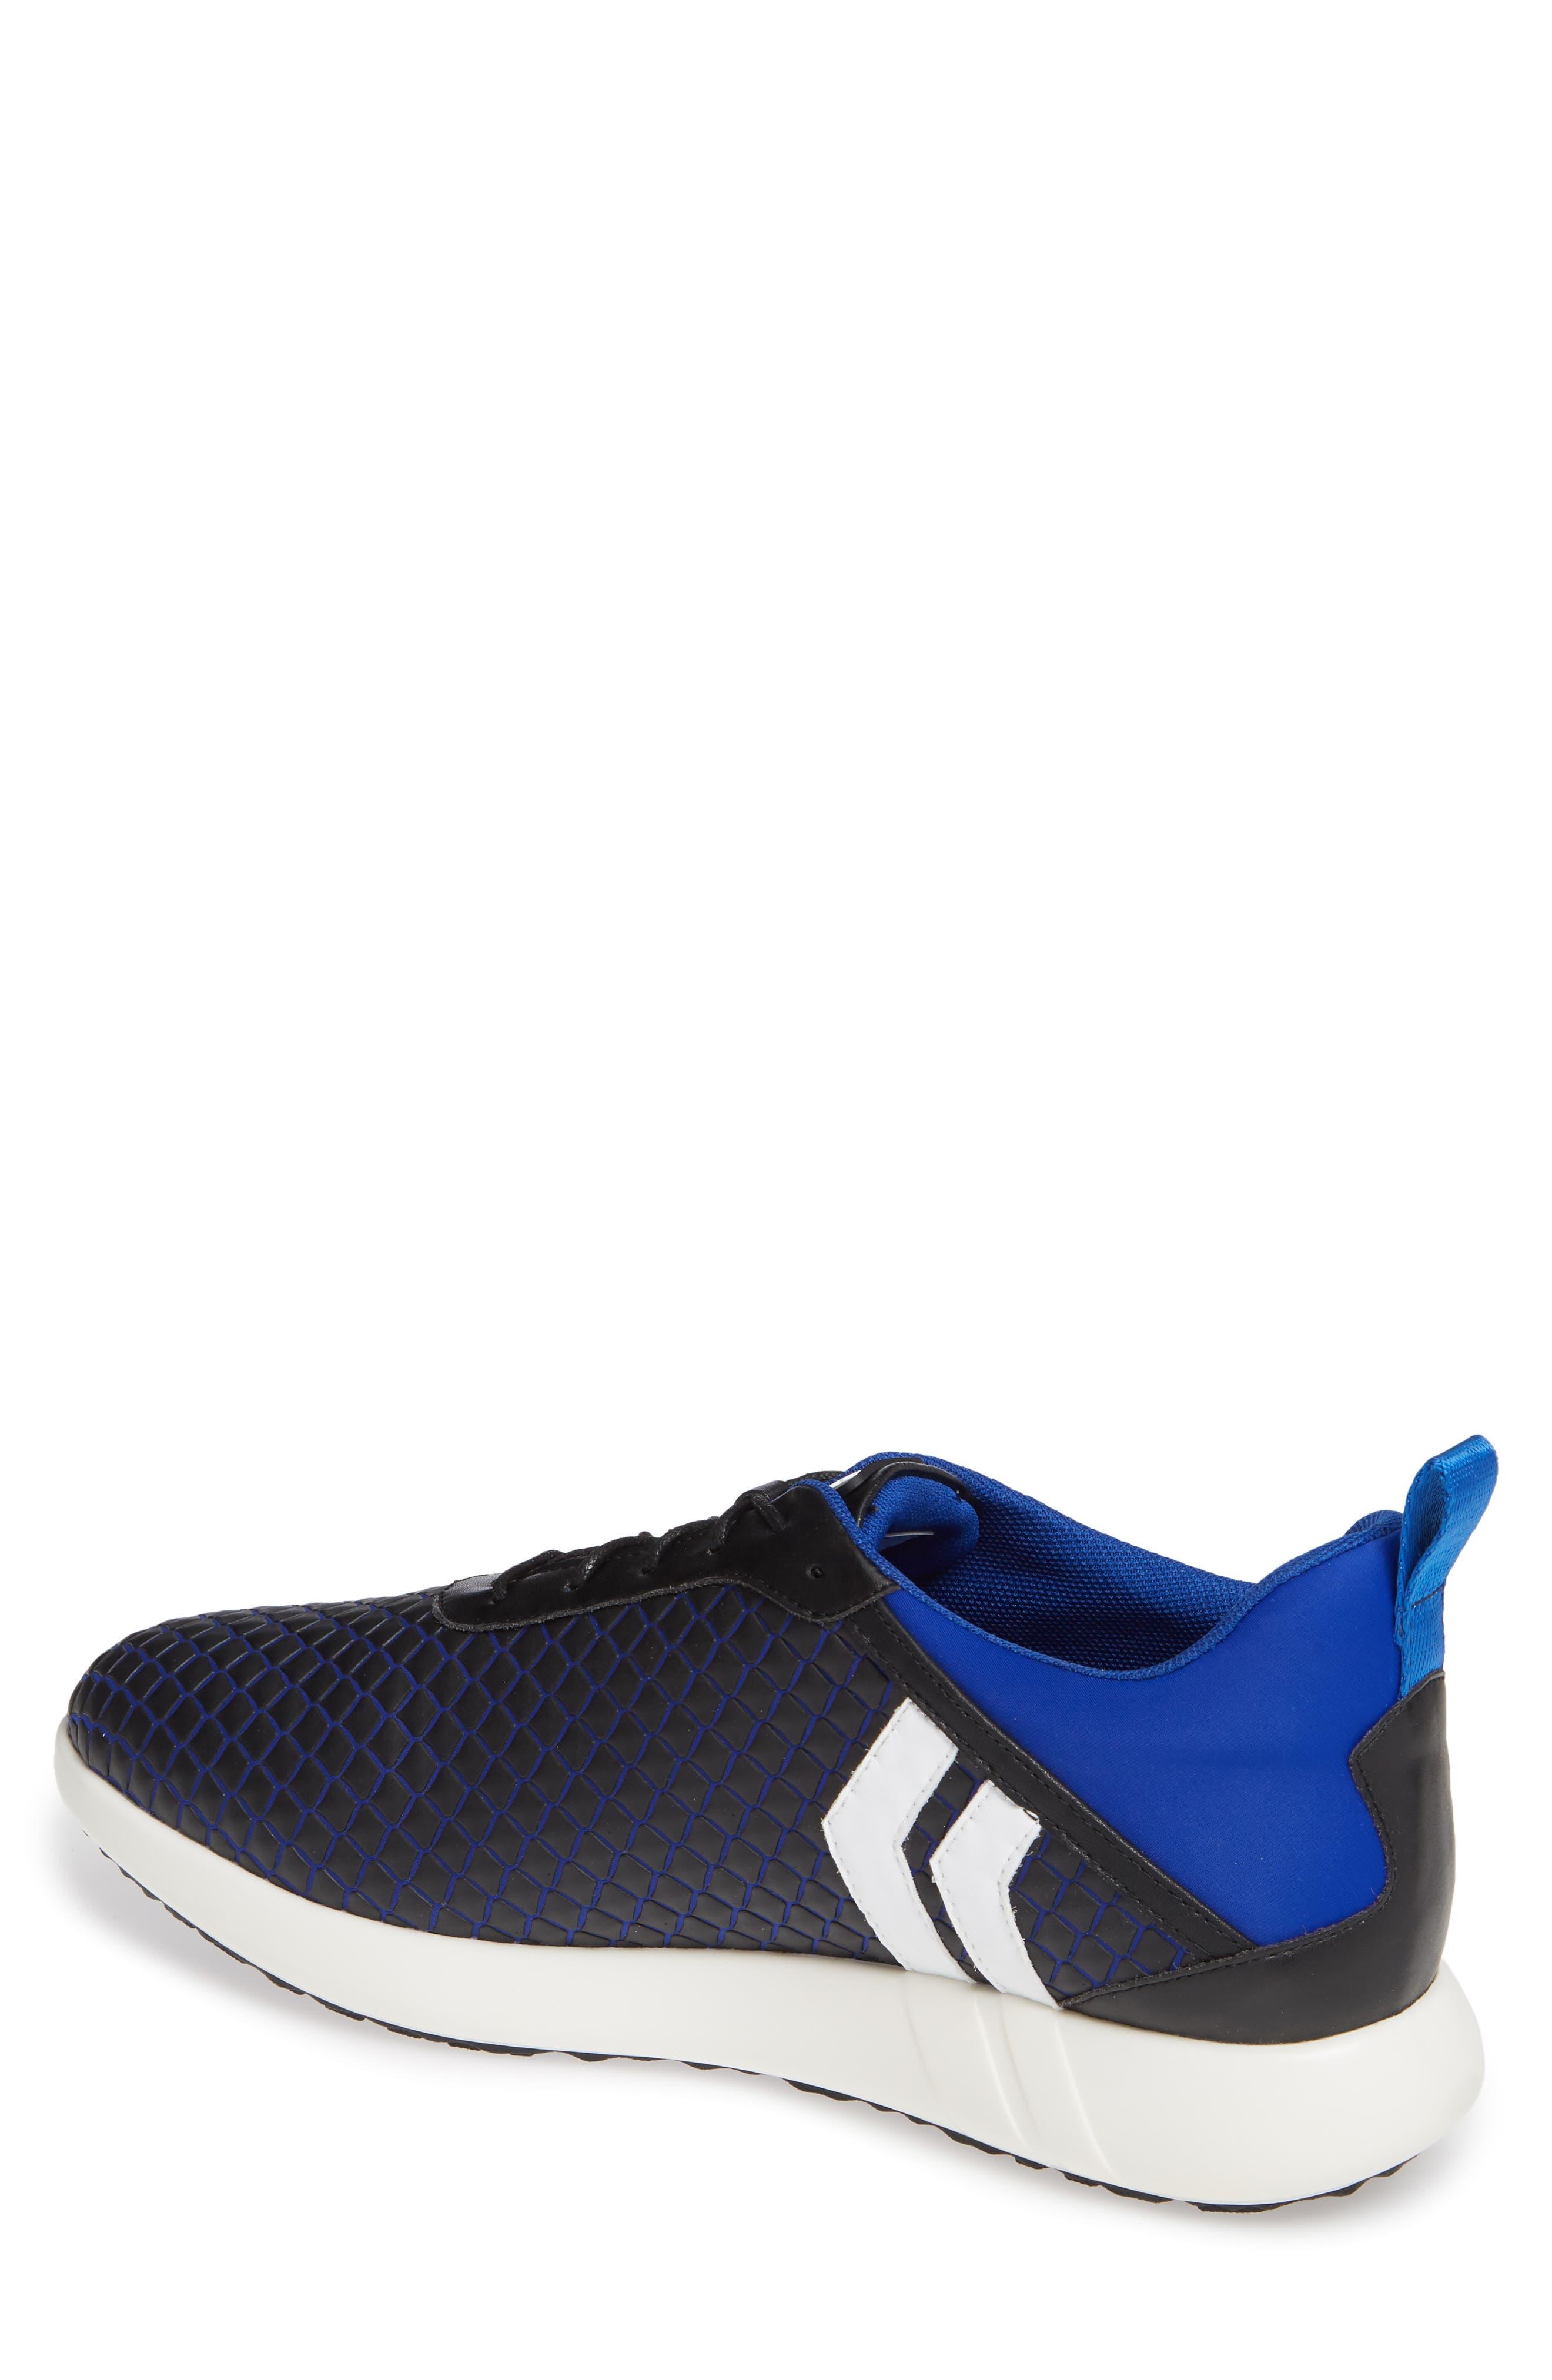 Onyx Sneaker,                             Alternate thumbnail 2, color,                             430